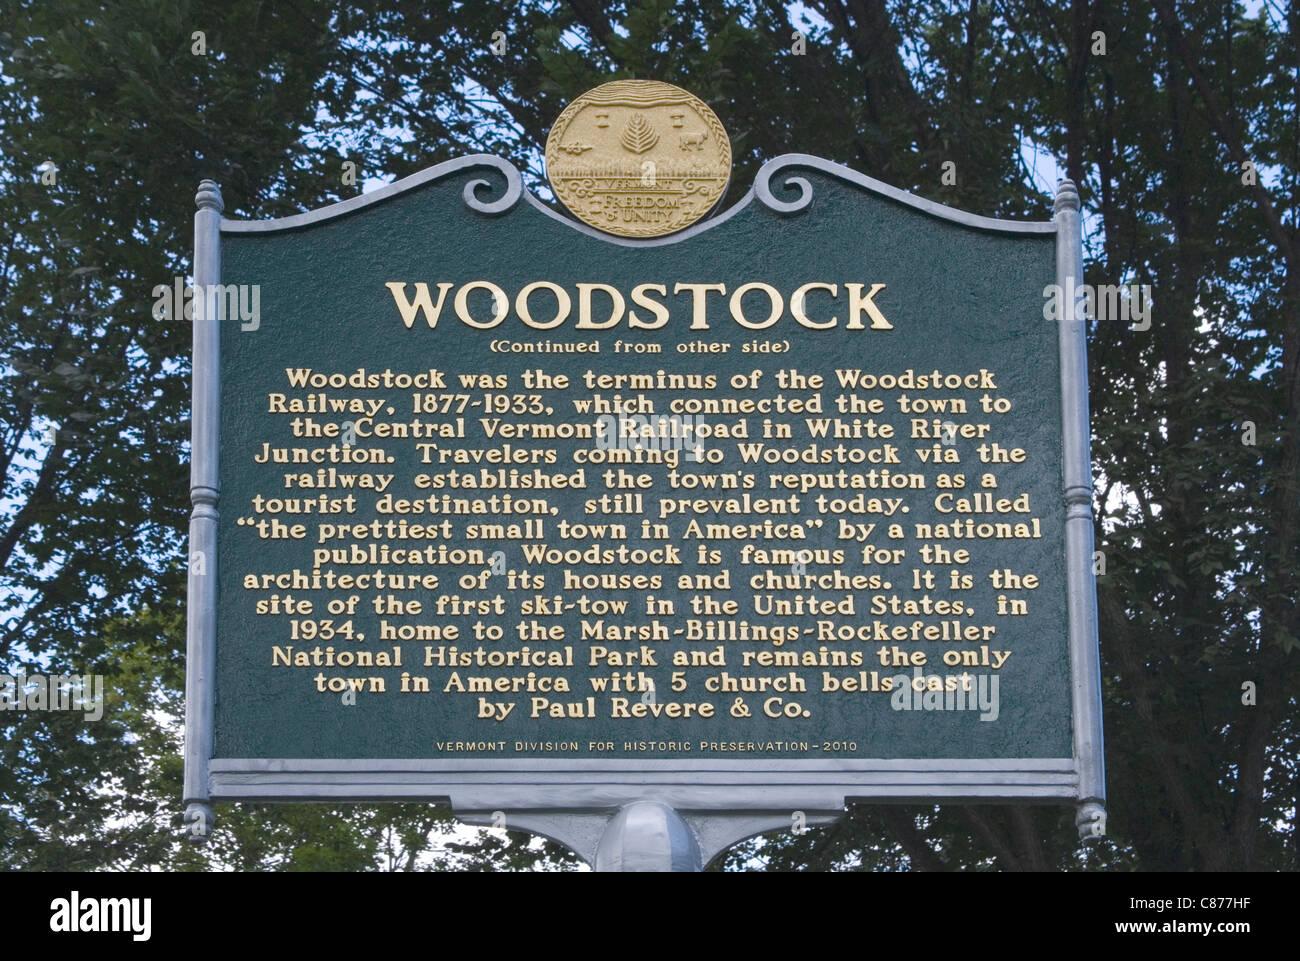 woodstock vermont celebrating its 250th anniversary - Stock Image